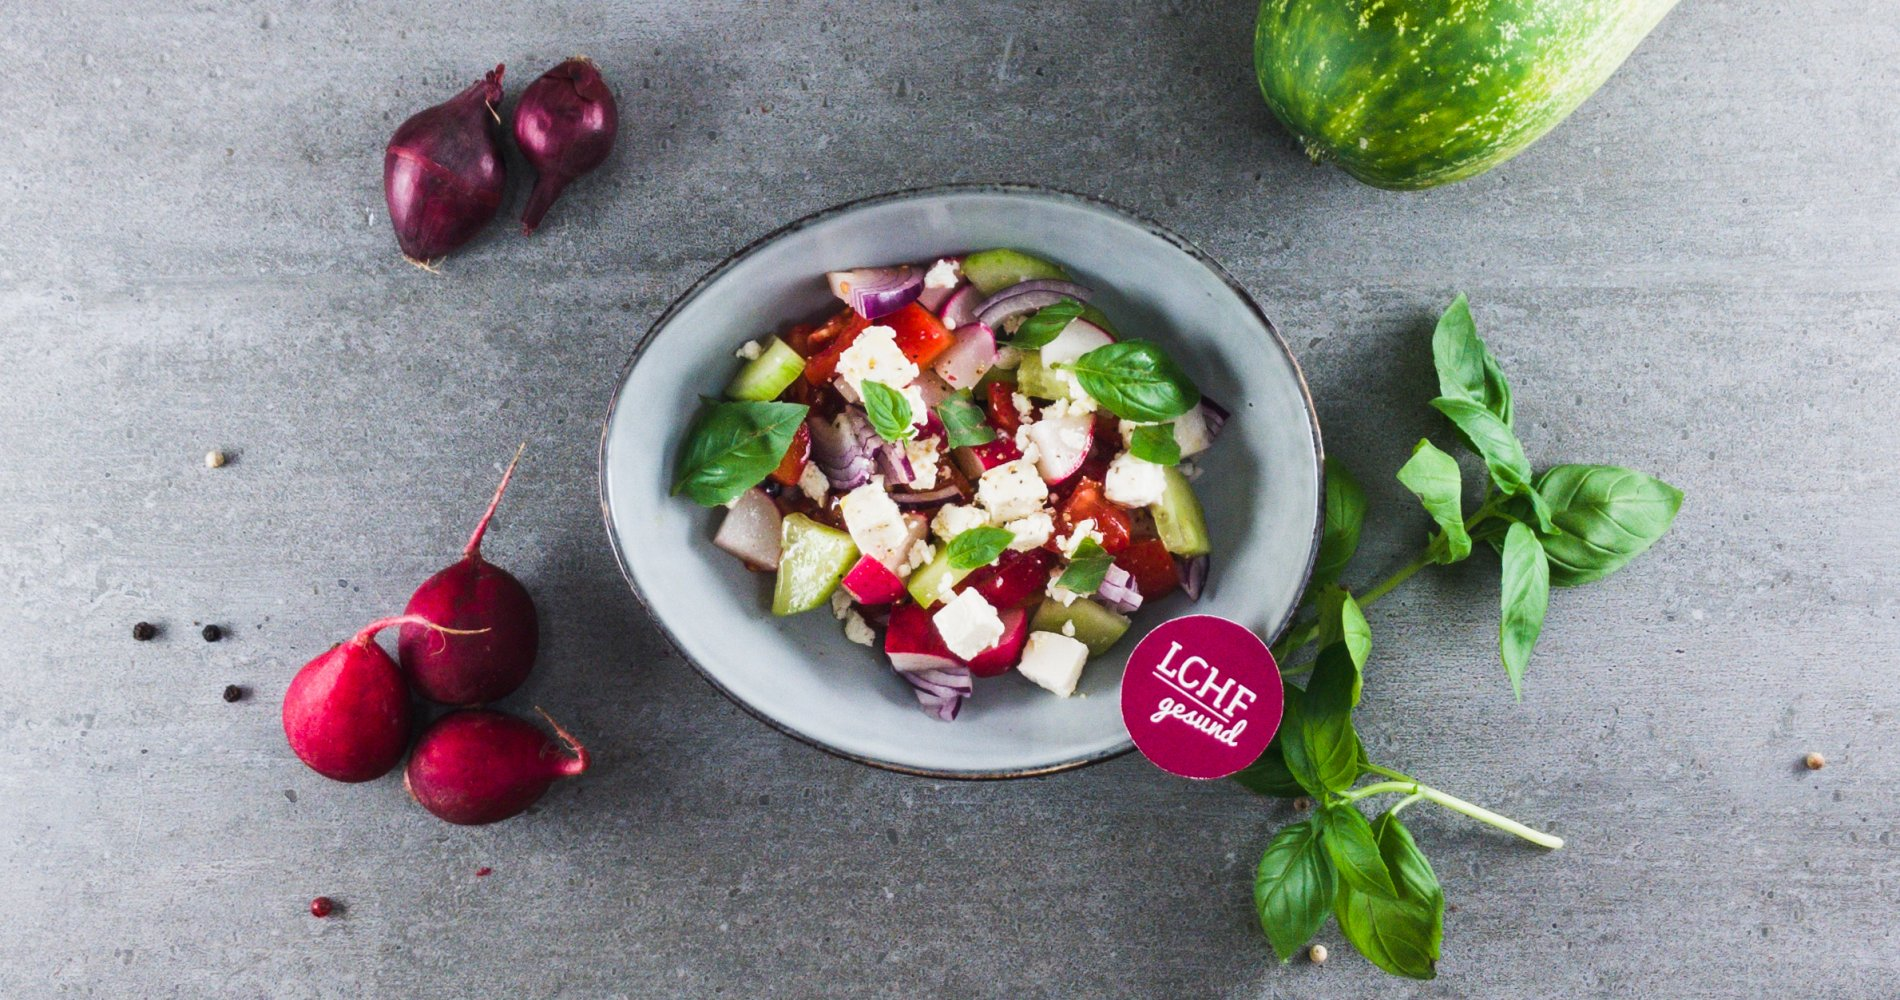 Rezept Low Carb: Bunter Paprika-Gurken-Tomatensalat - LCHF-gesund.de